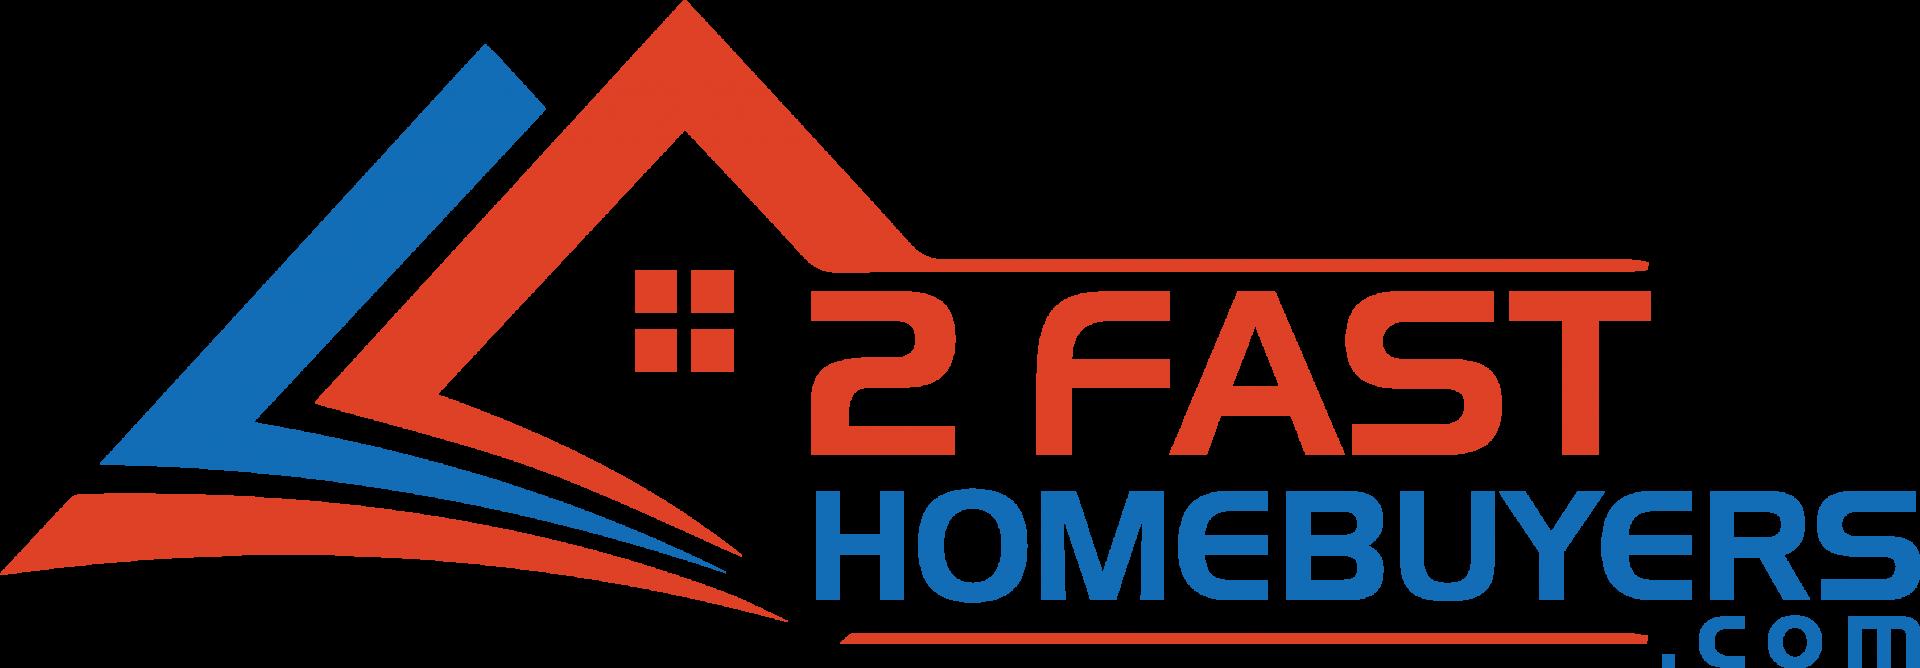 2FastHomebuyers.com logo